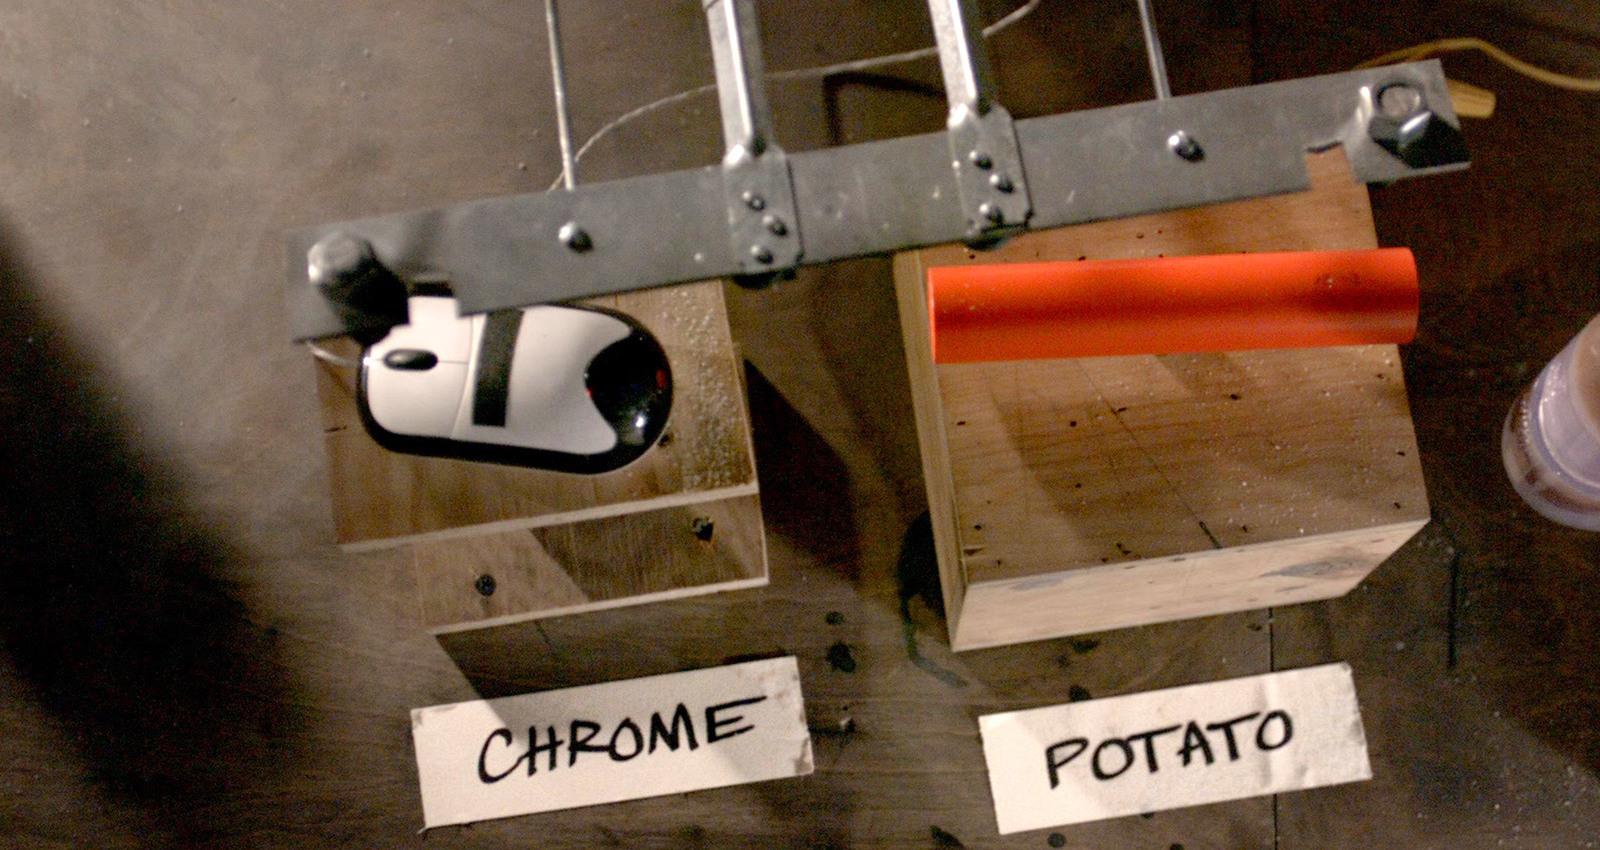 Chrome Speed Tests